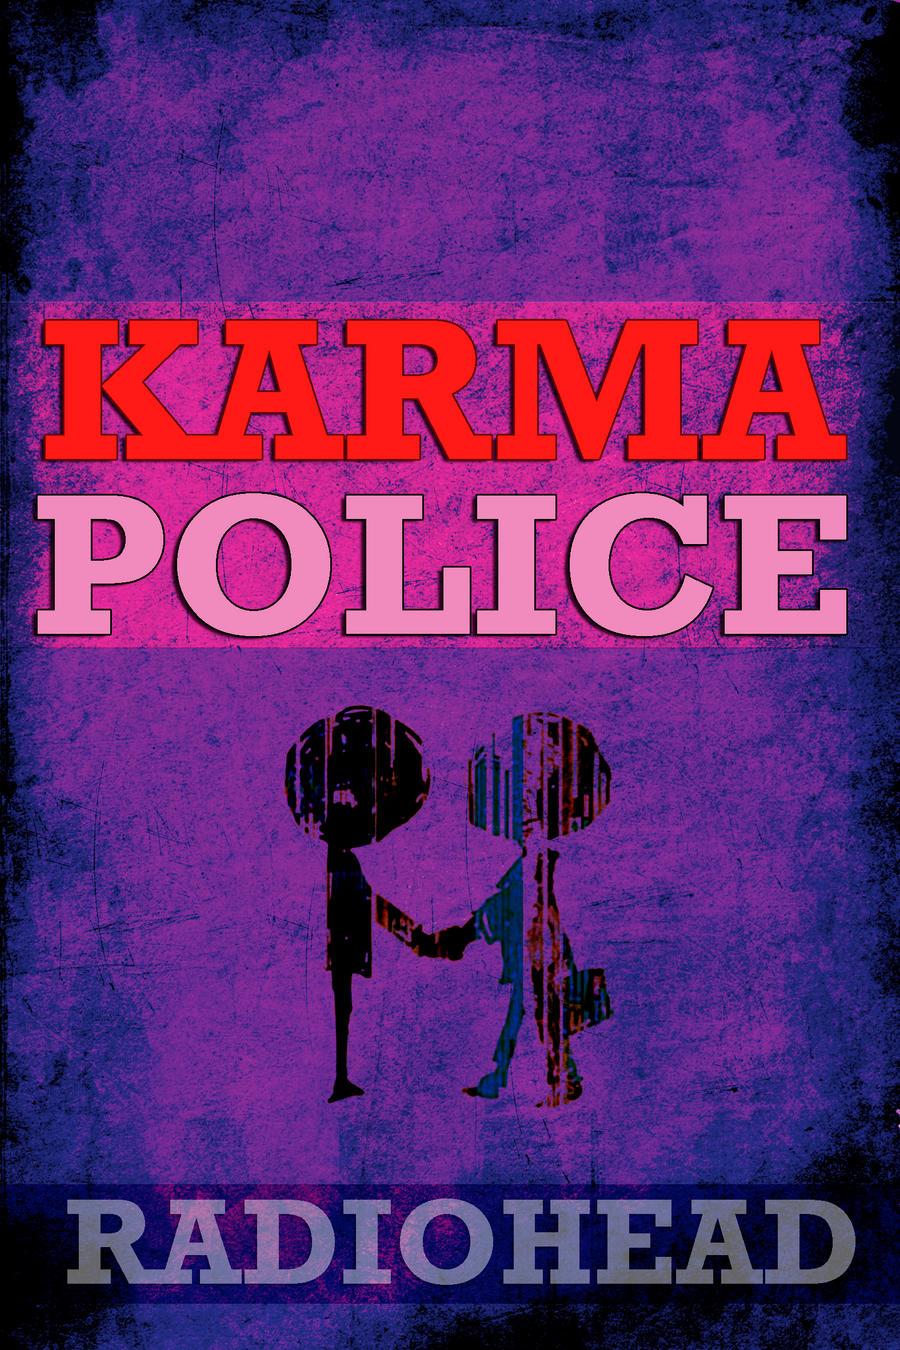 http://img04.deviantart.net/8301/i/2011/167/0/e/karma_police_by_mcrockstar-d3j22fz.jpg